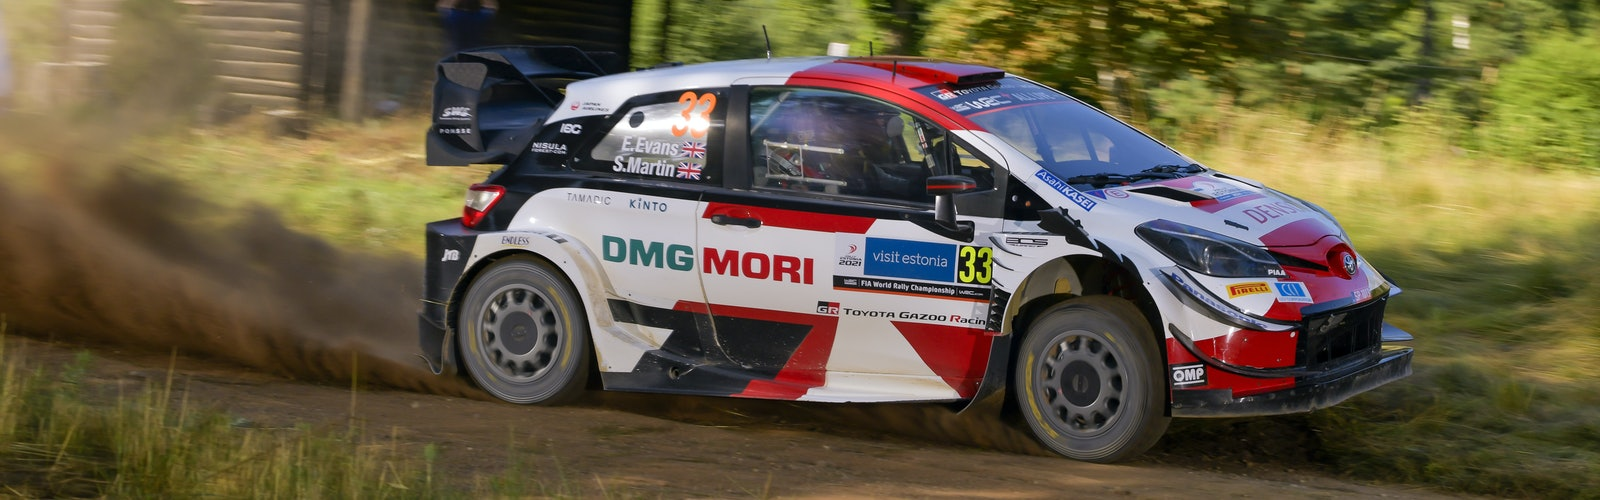 WRC_2021_Rd.7_274